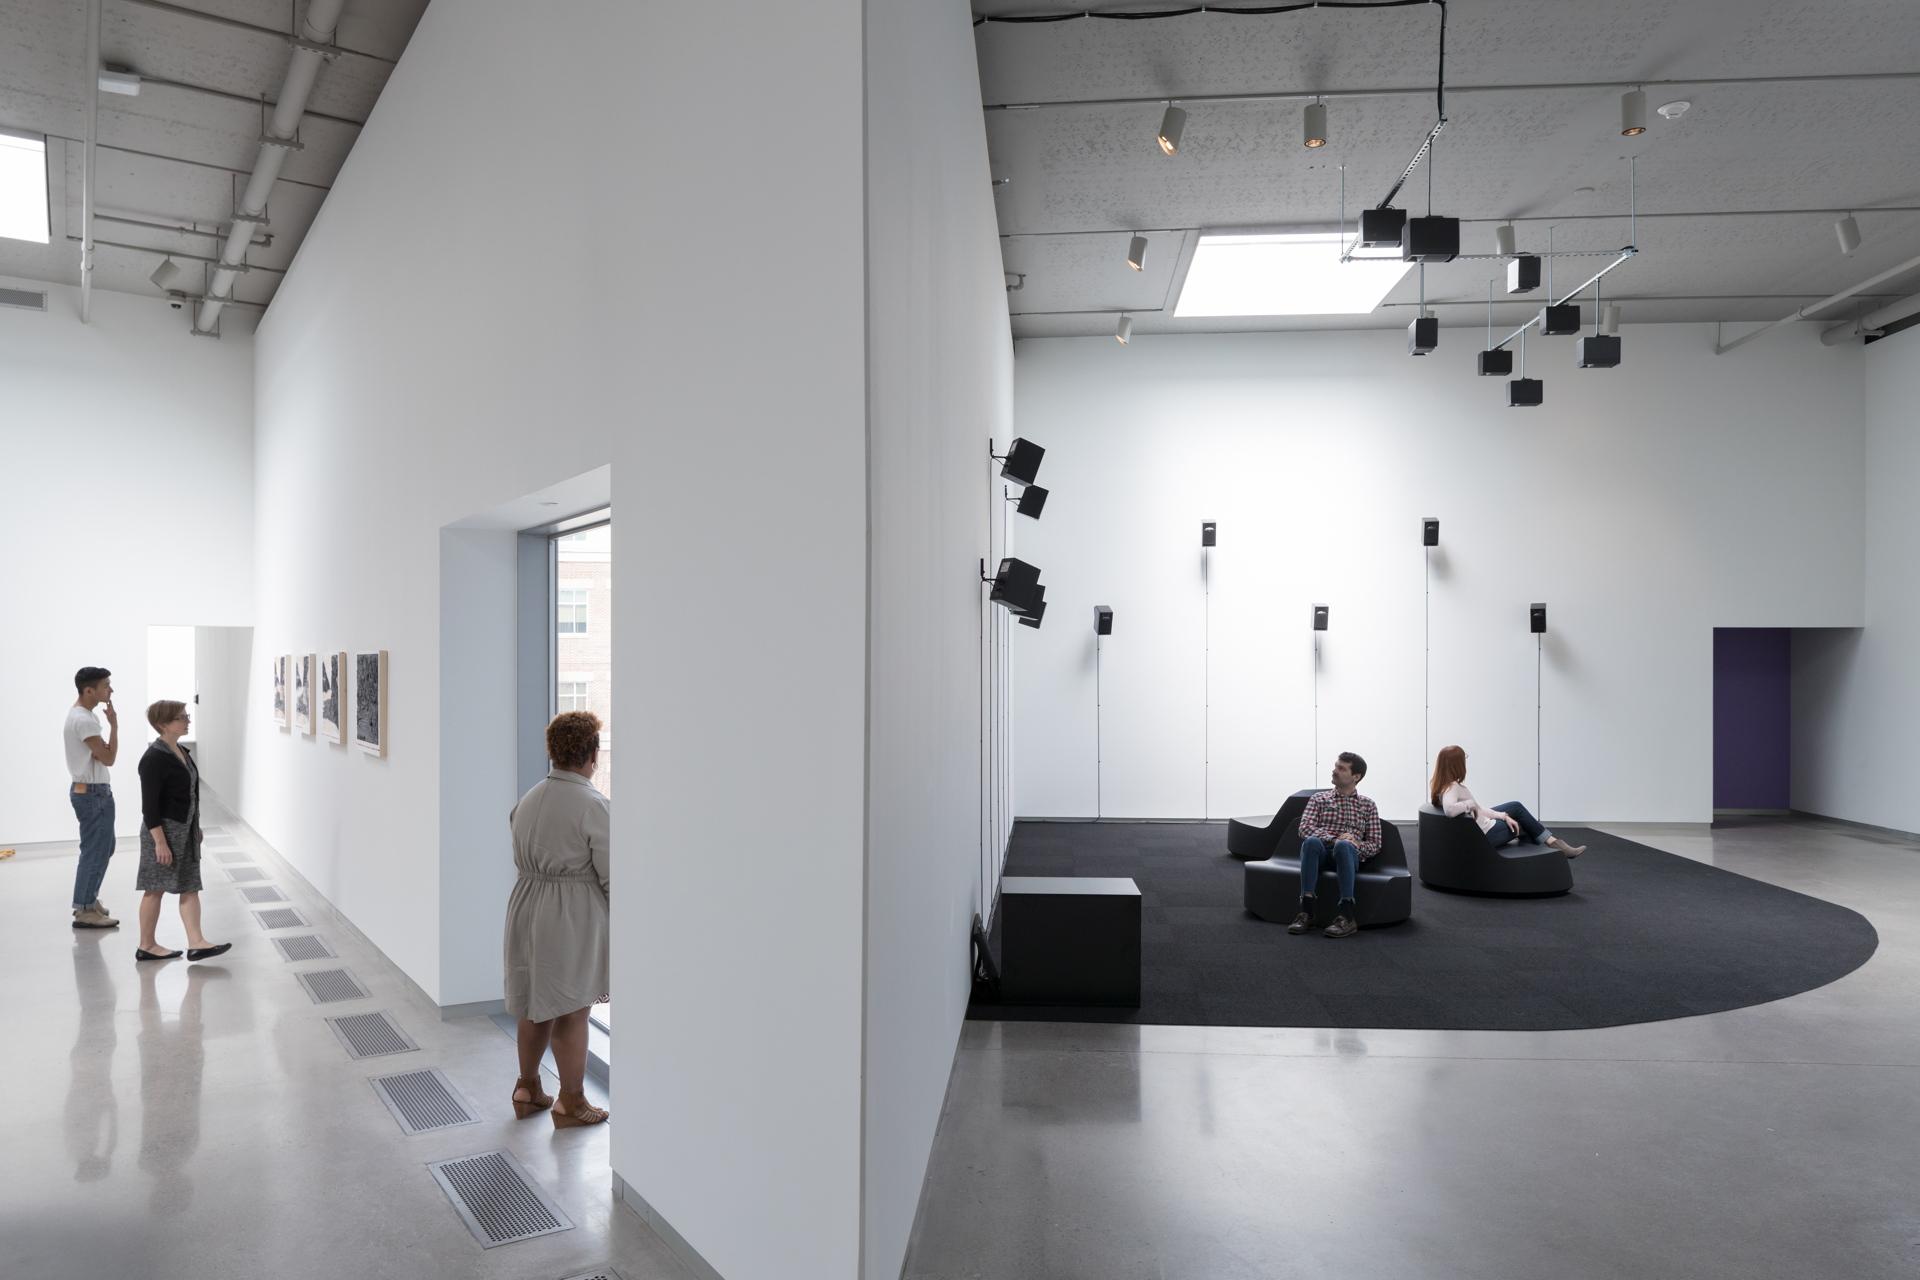 Steven Holl: Instituto de Arte Contemporáneo en Richmond